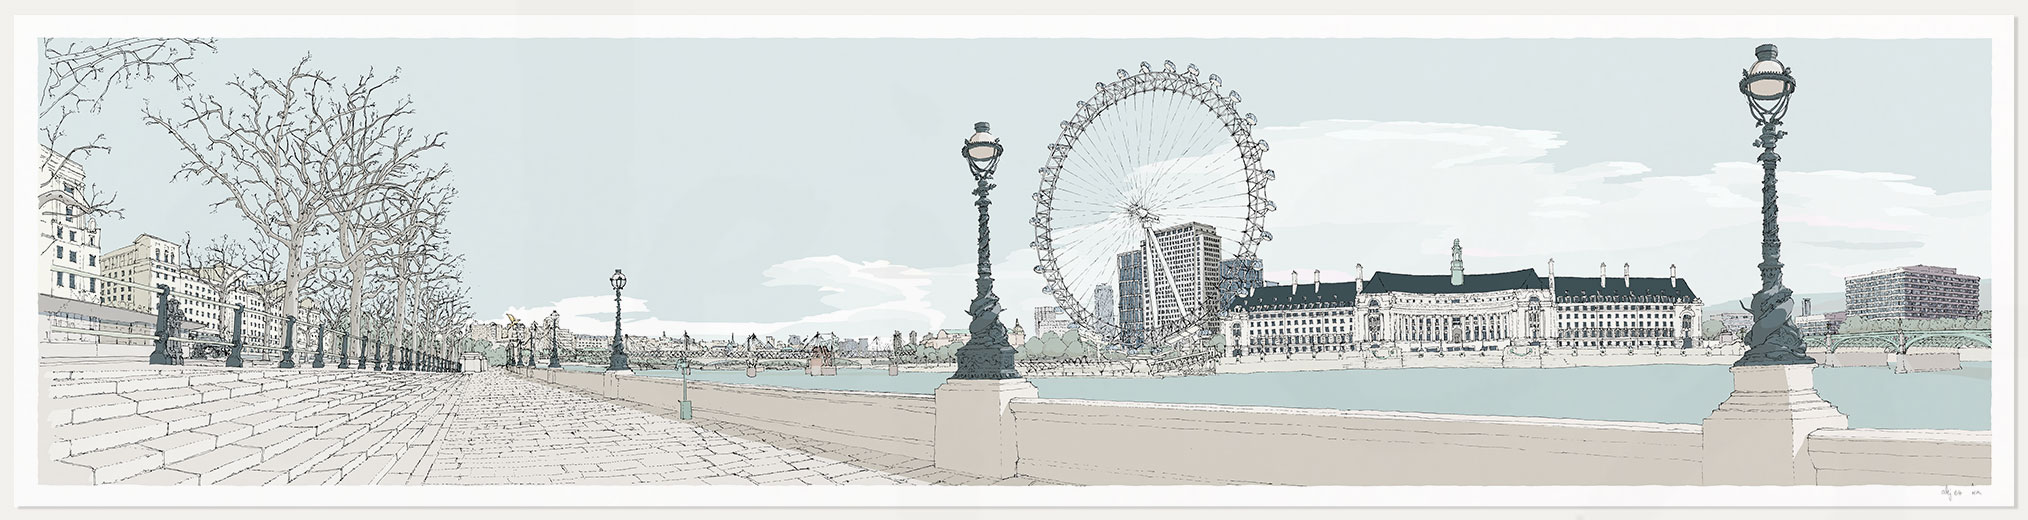 print named London River Thames by Westminster Bridge Pebble Beach by artist alej ez